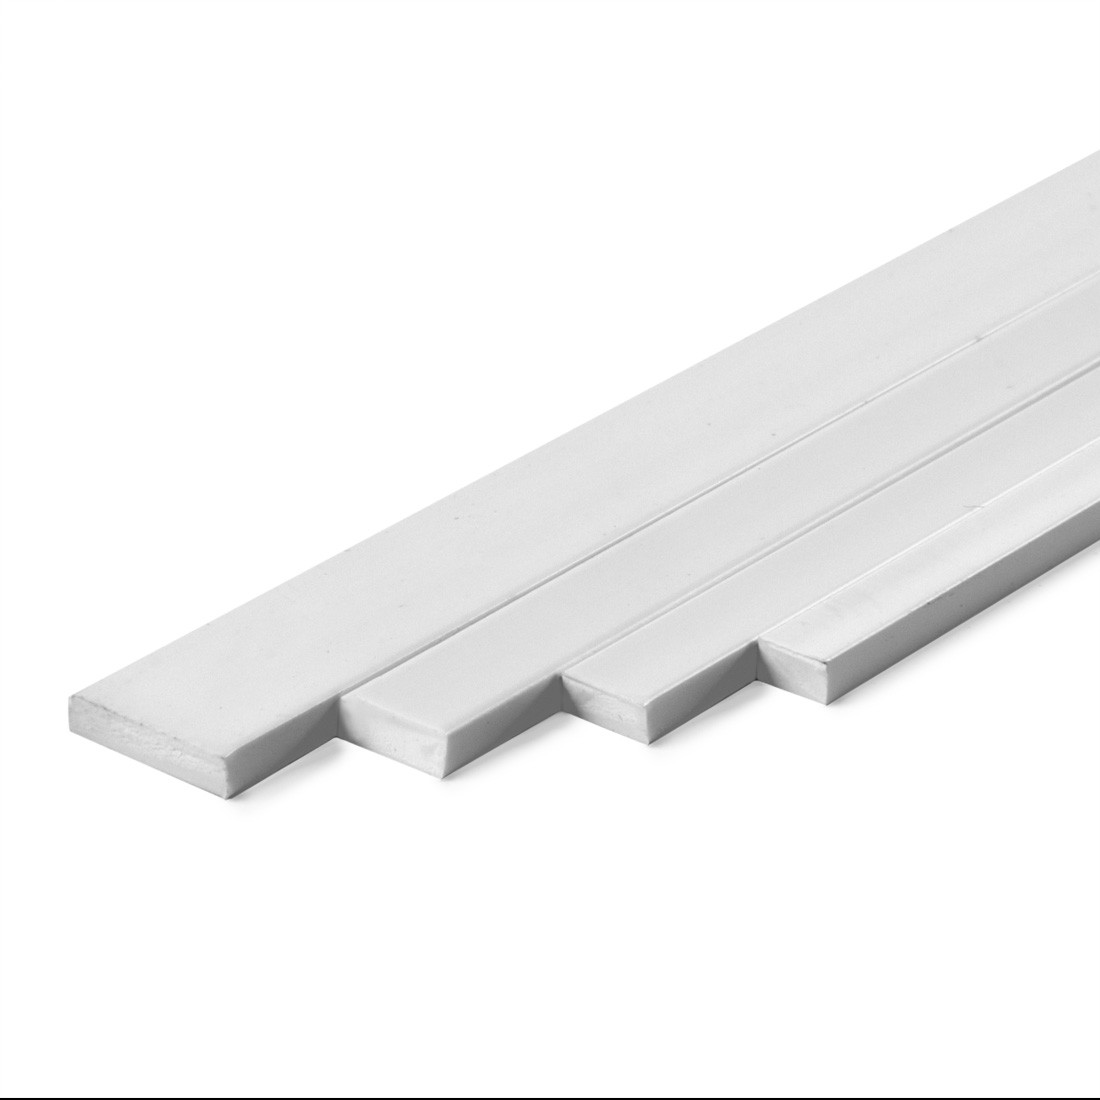 Profile ASA rectangulaire mm.2x5x1000